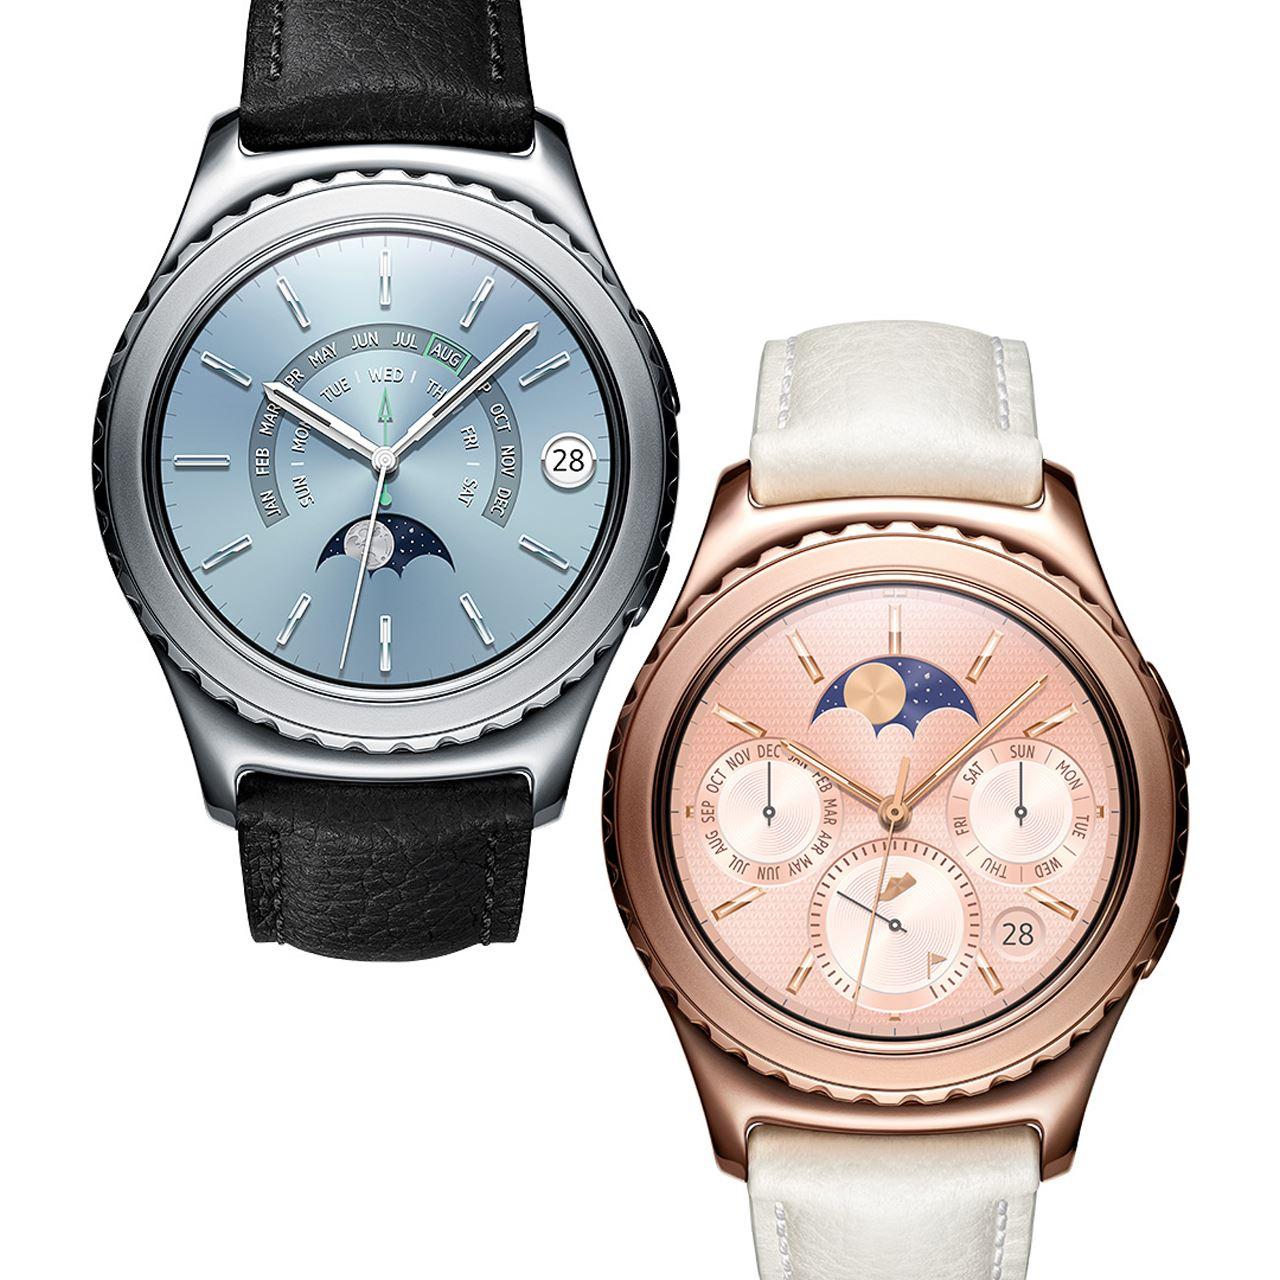 Samsung Smartwatch Gear S2 classic, platin